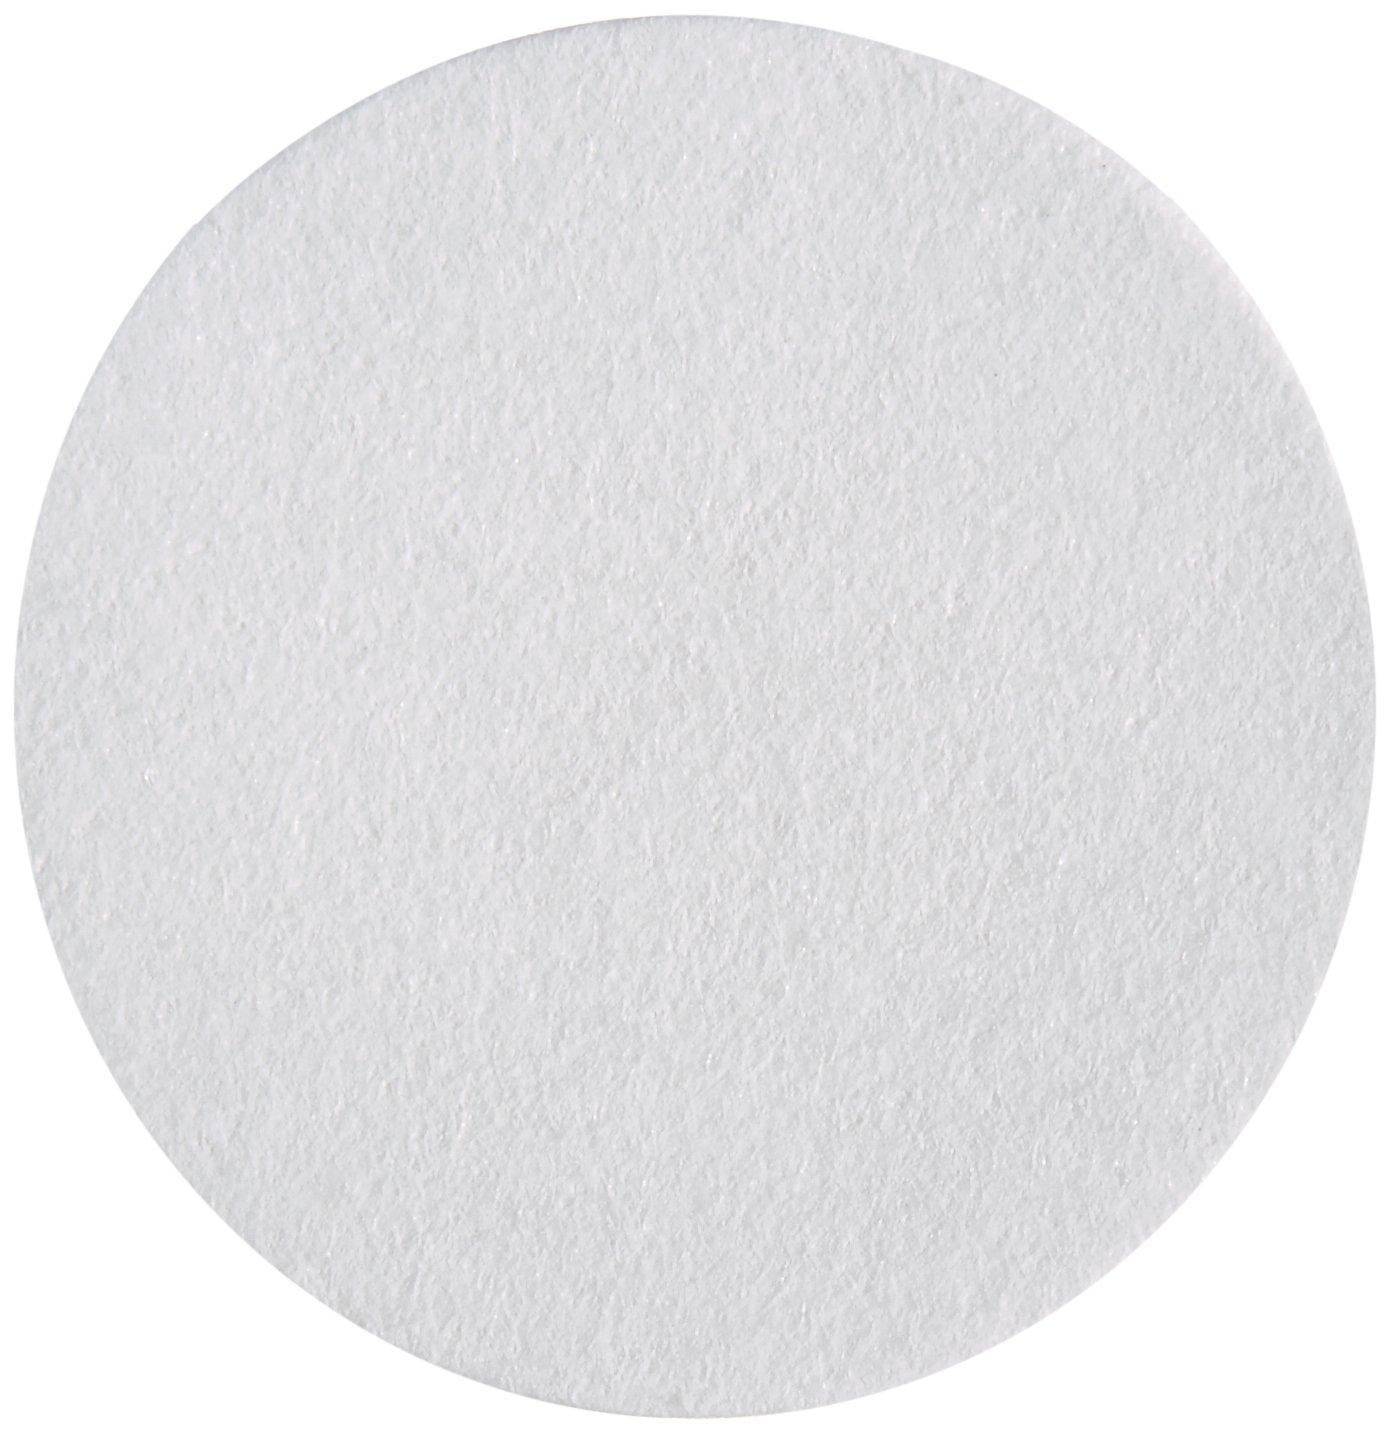 THOQD 0898R41PK Whatman 1540324 Quantitative Hardened Low Ash Filter Circles Pack of 100 24 mm Grade 540 Maximum Volume 454 ml//m